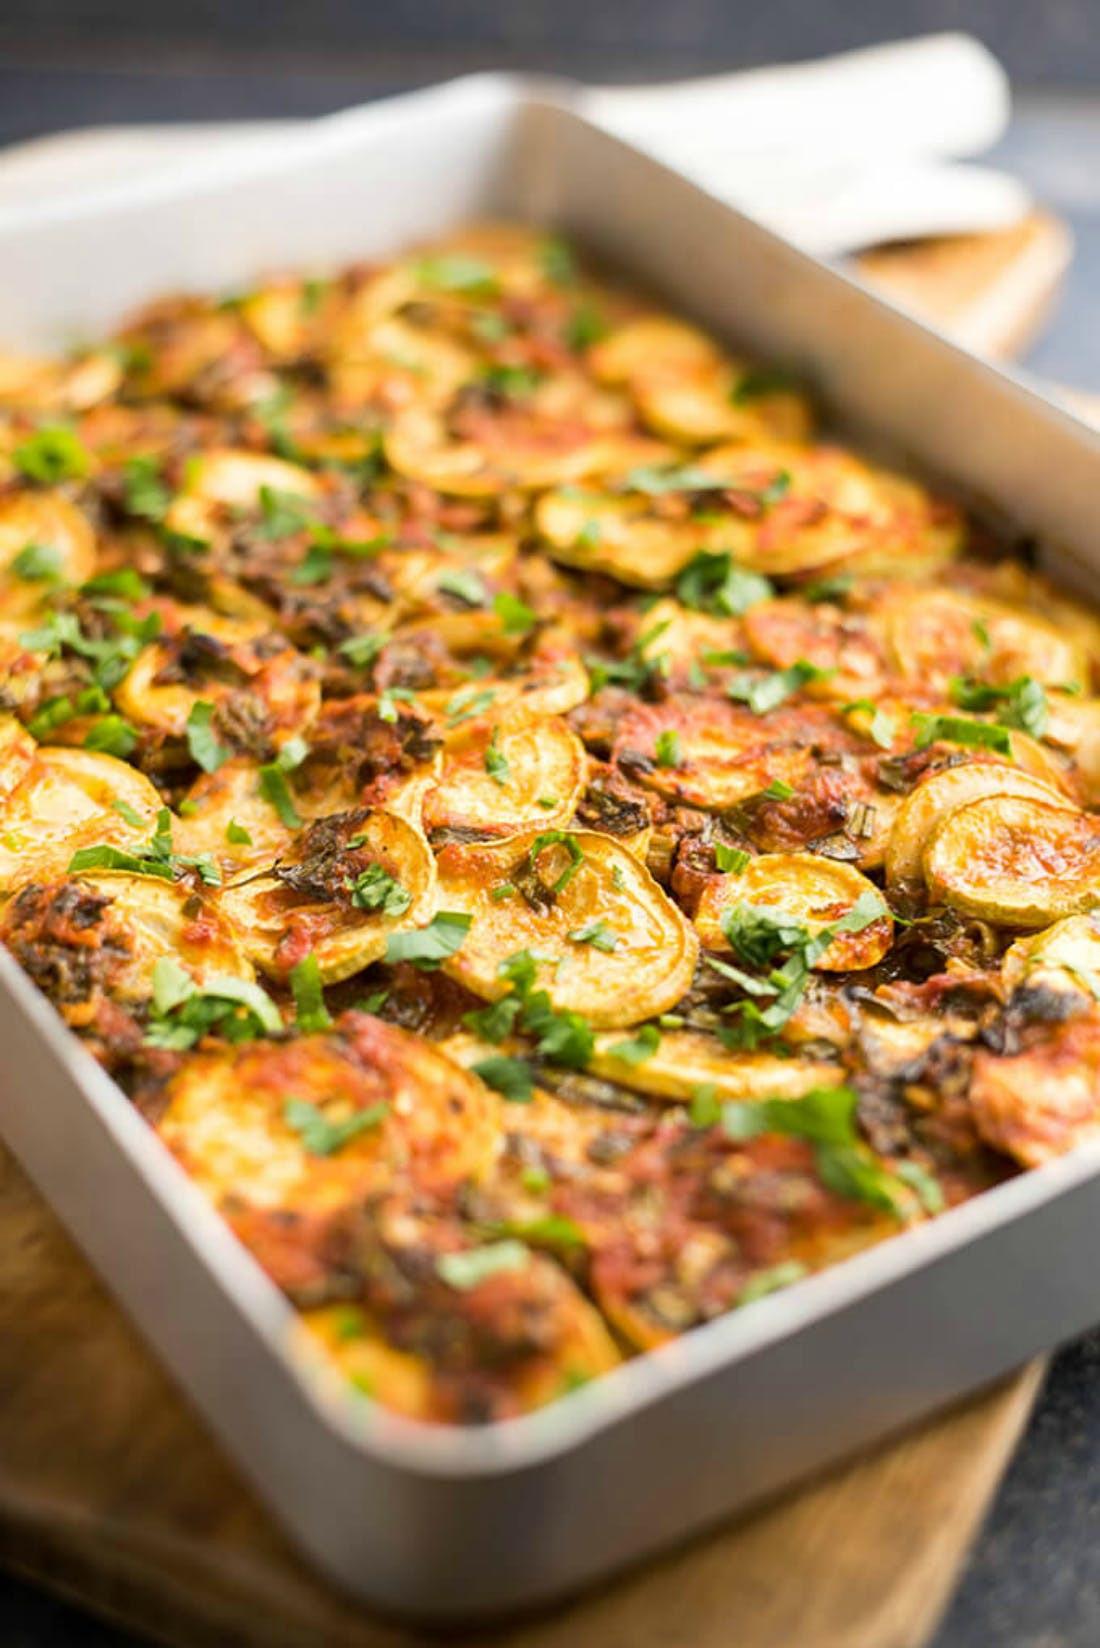 Vegetarian Paleo Recipes  18 Vegan Paleo Recipes So Good You Might Convert